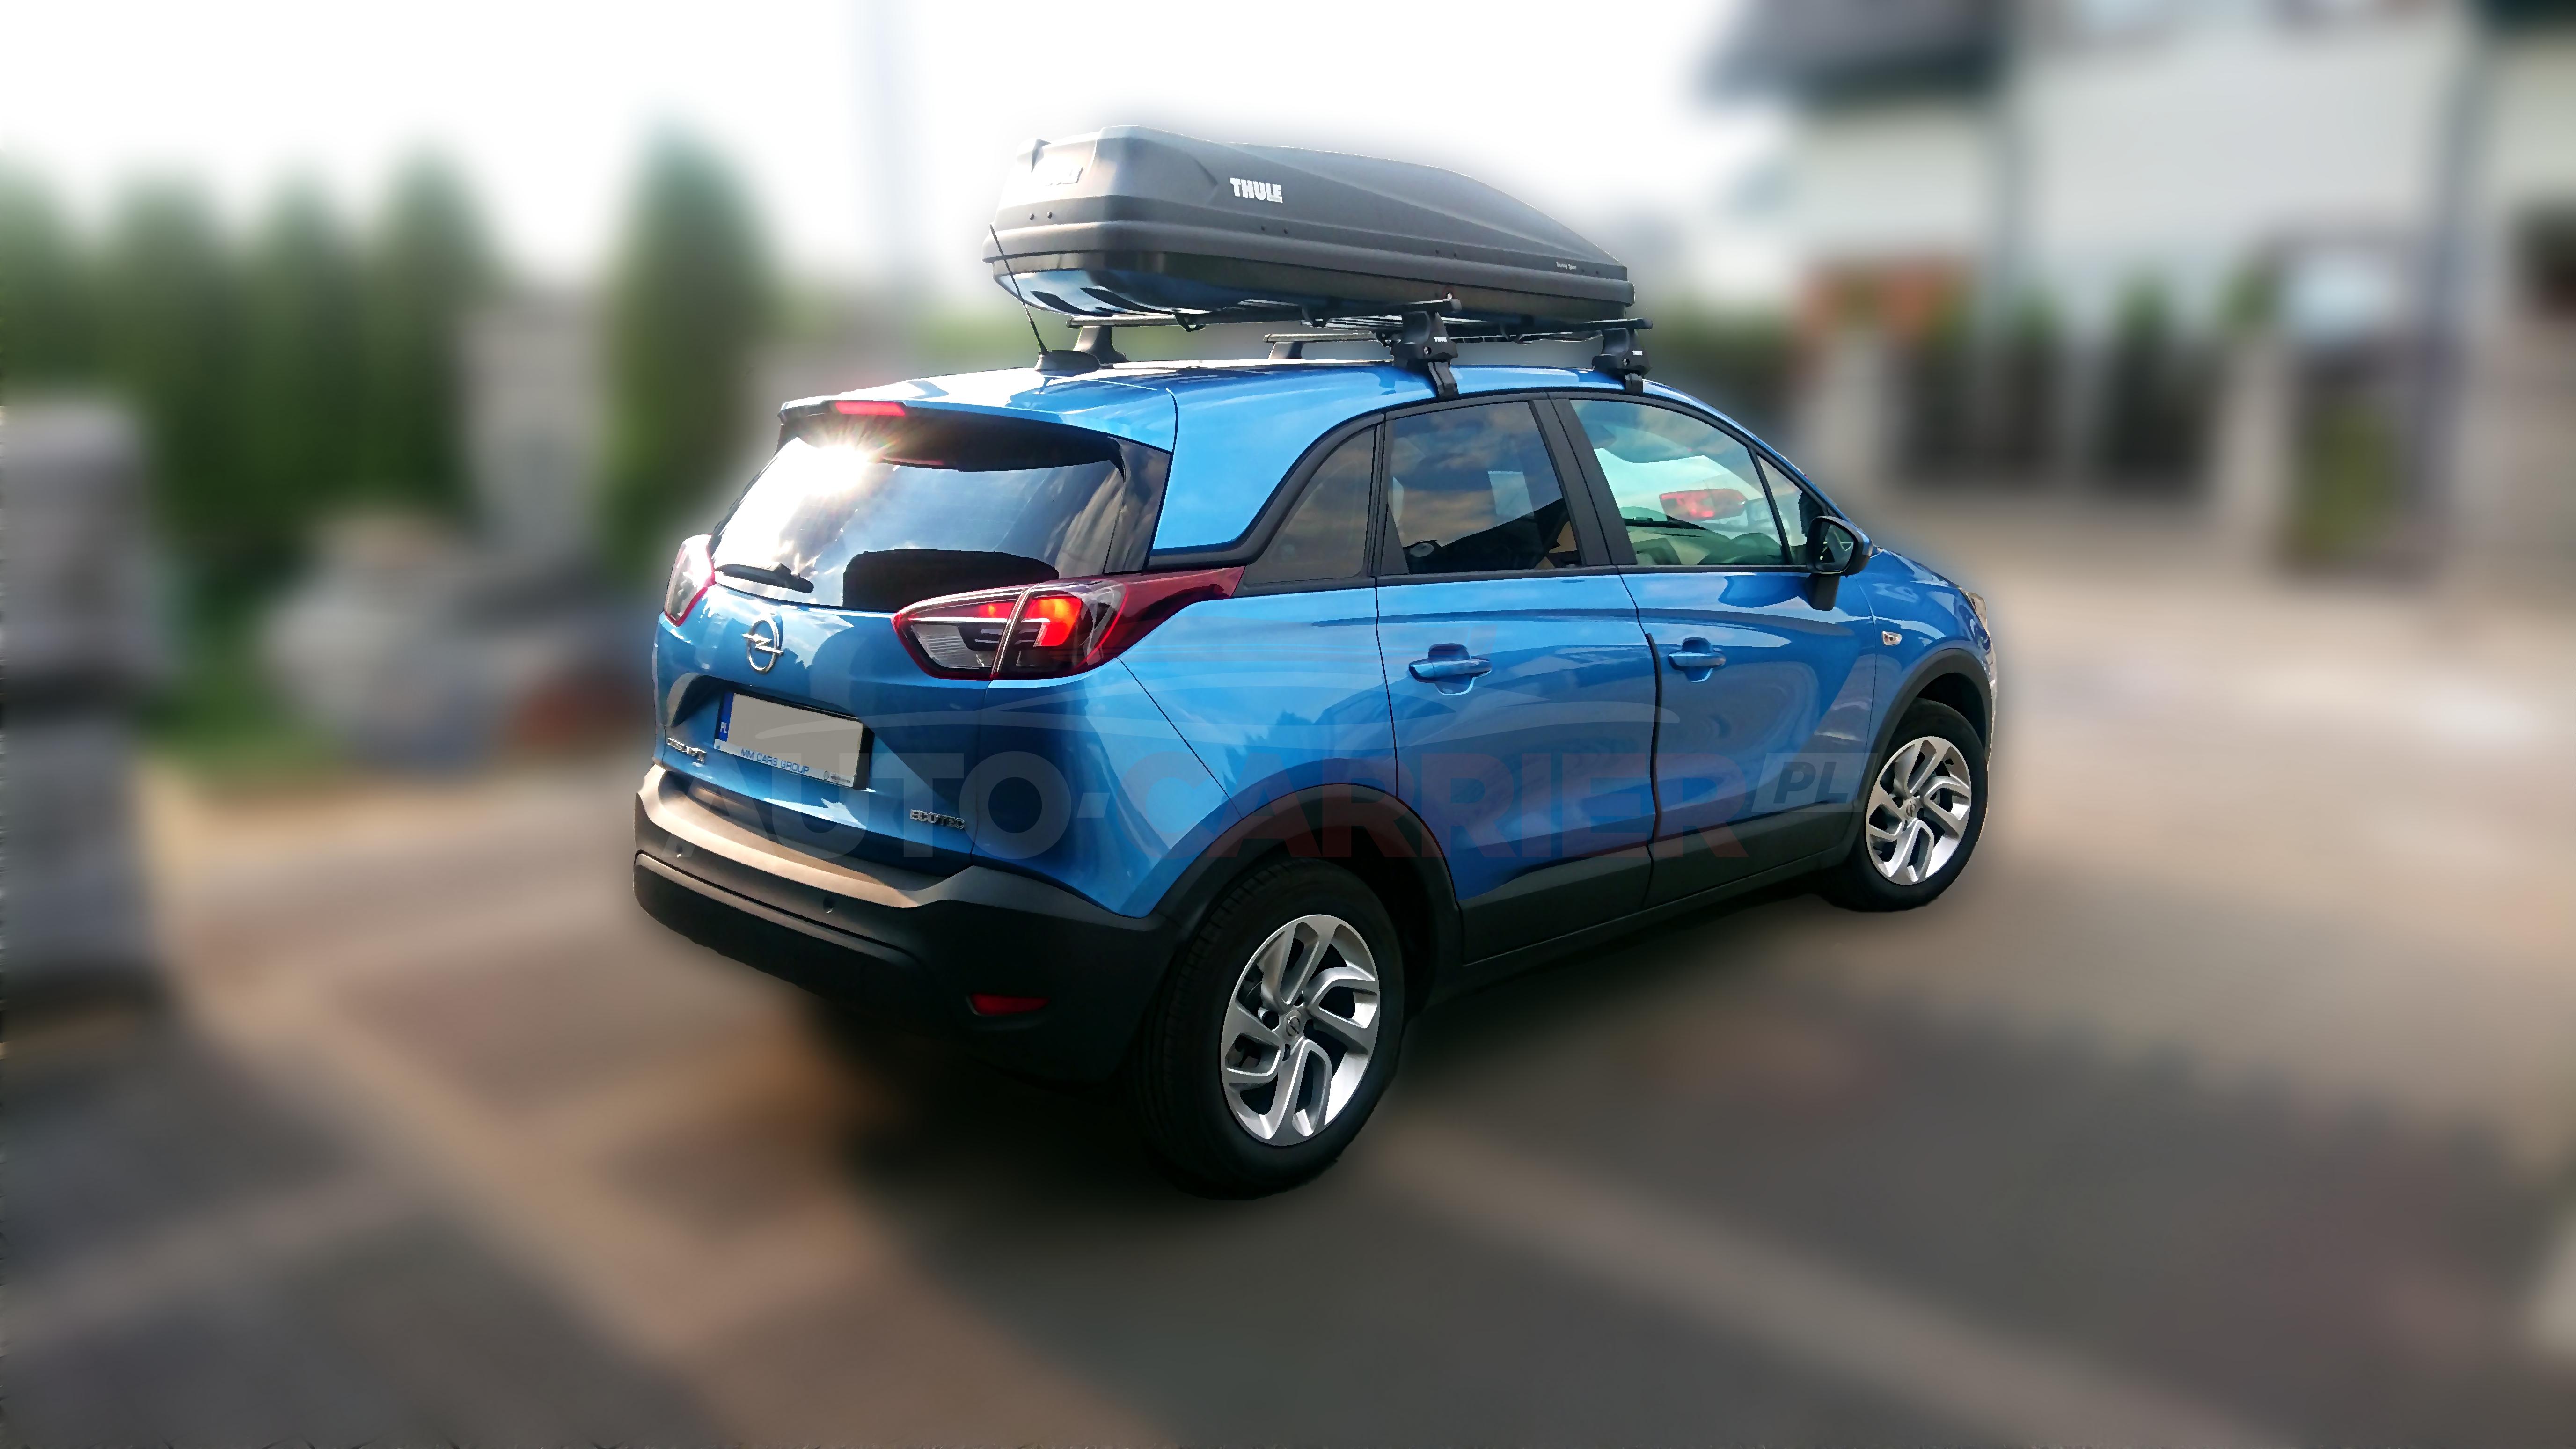 Nowy Opel Crossland X z bagażnikami Thule